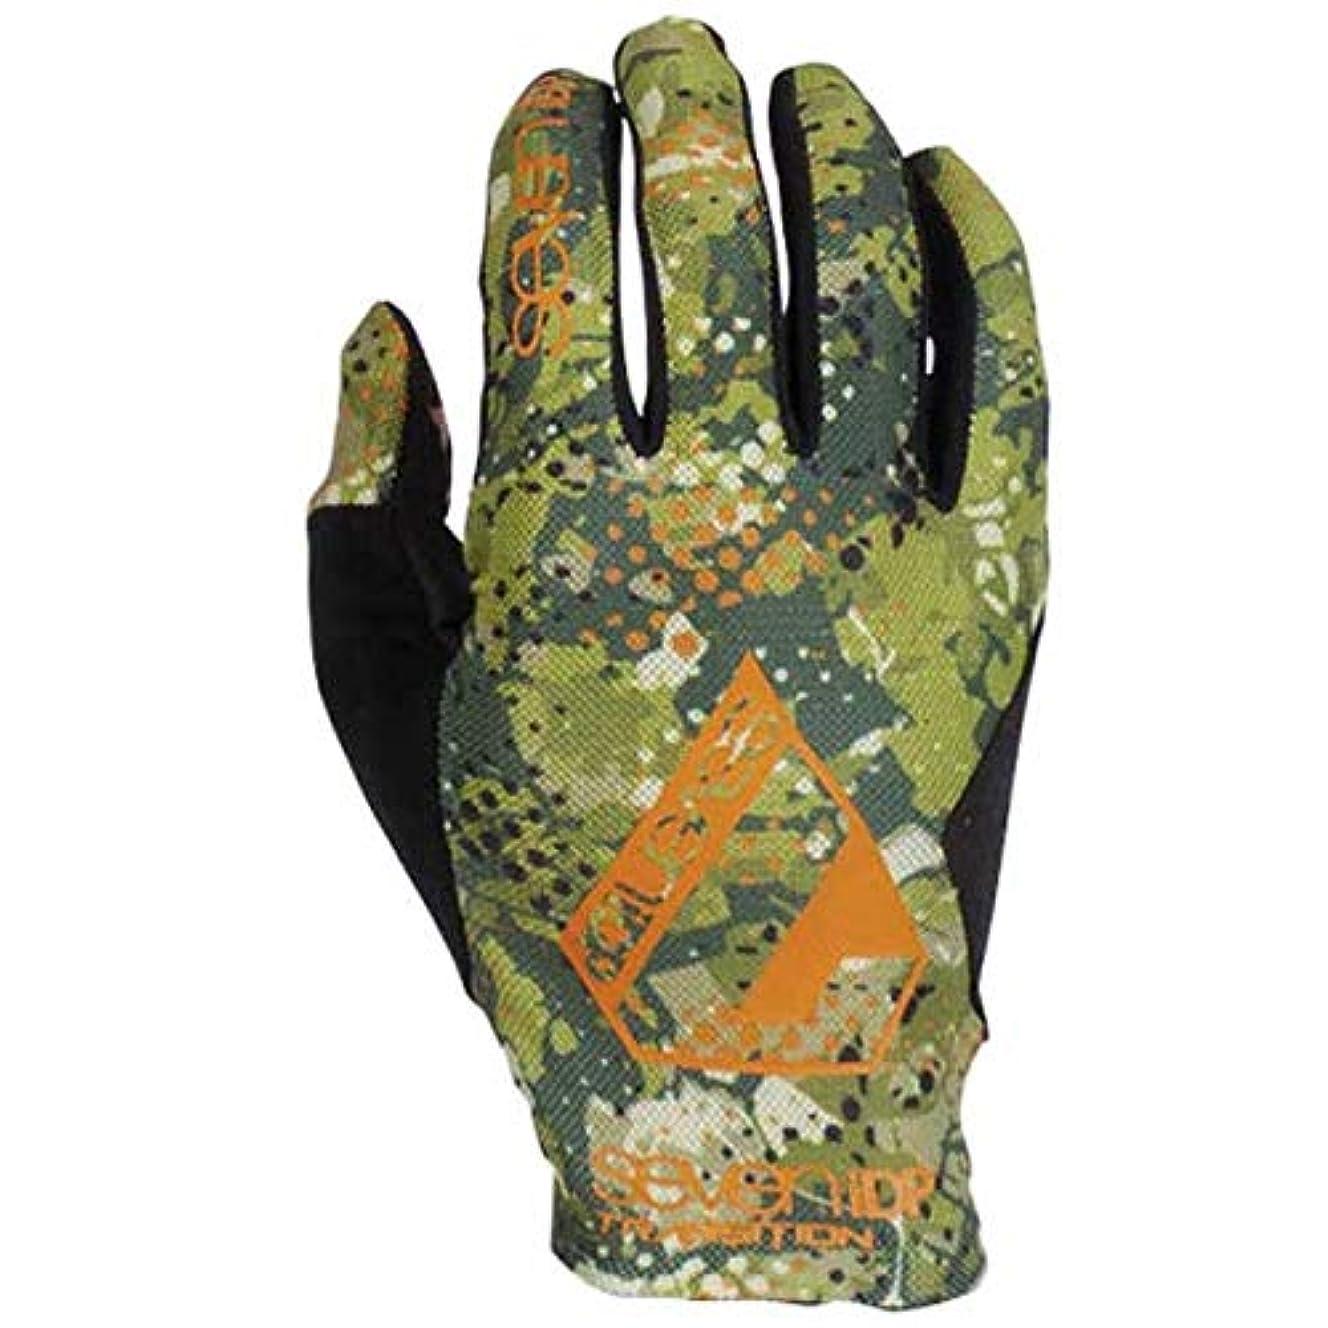 Transition Glove Orange/CAMO/Black M